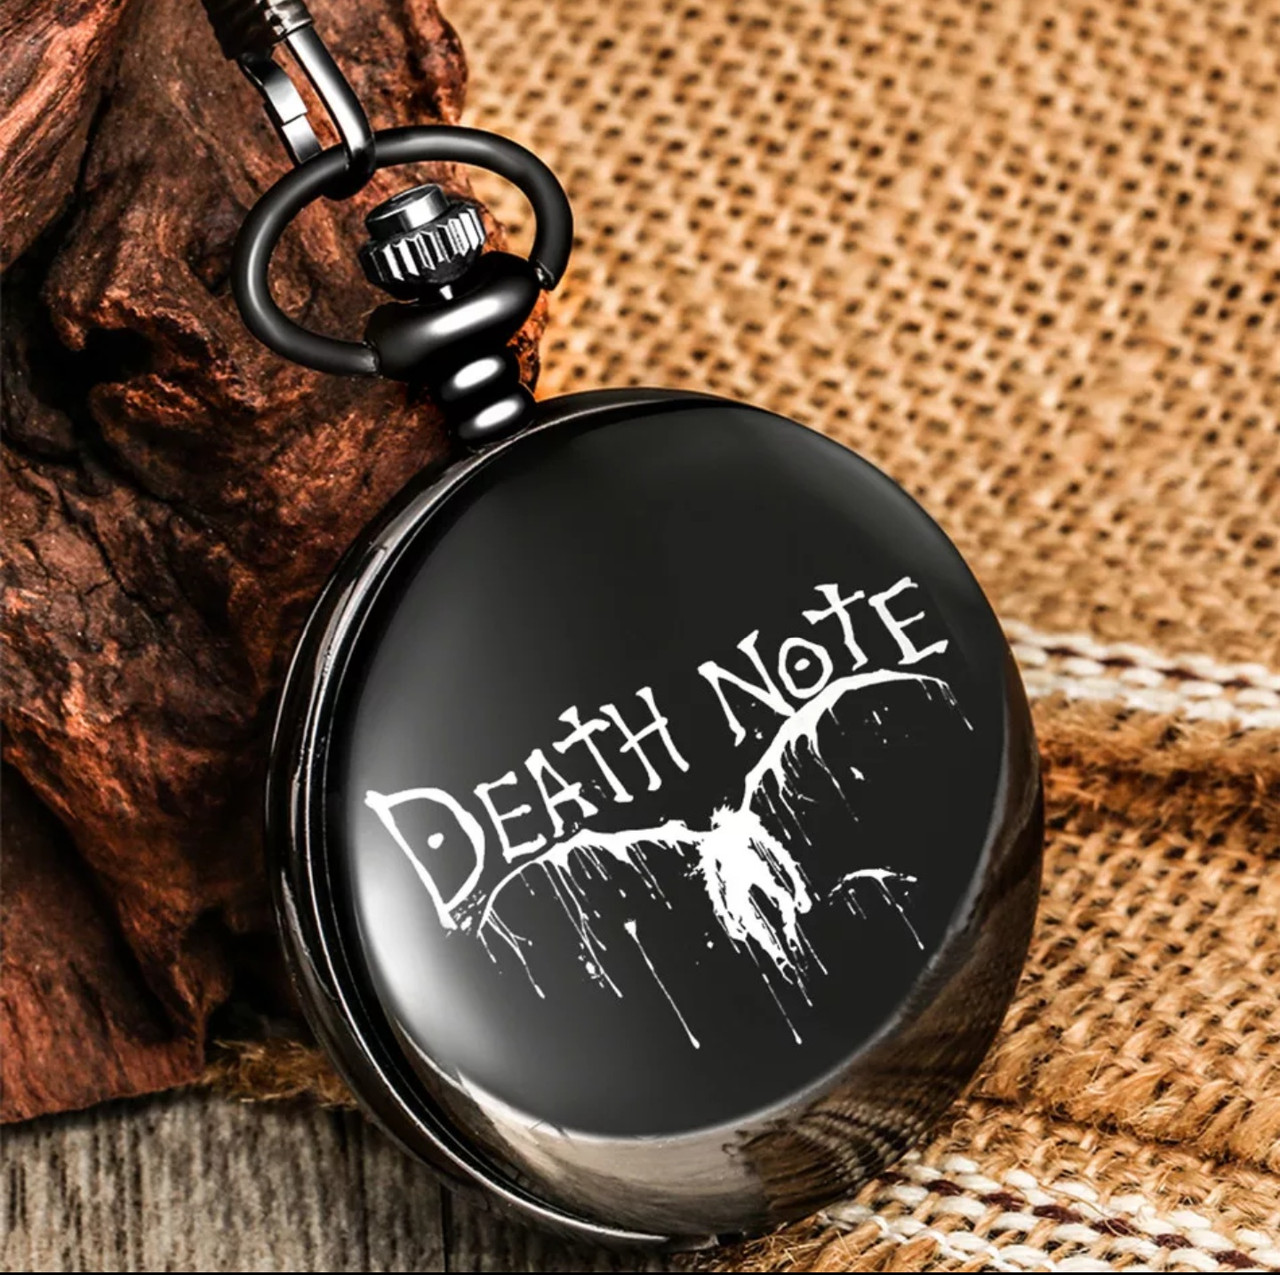 Карманные мужские часы на цепочке Death Note